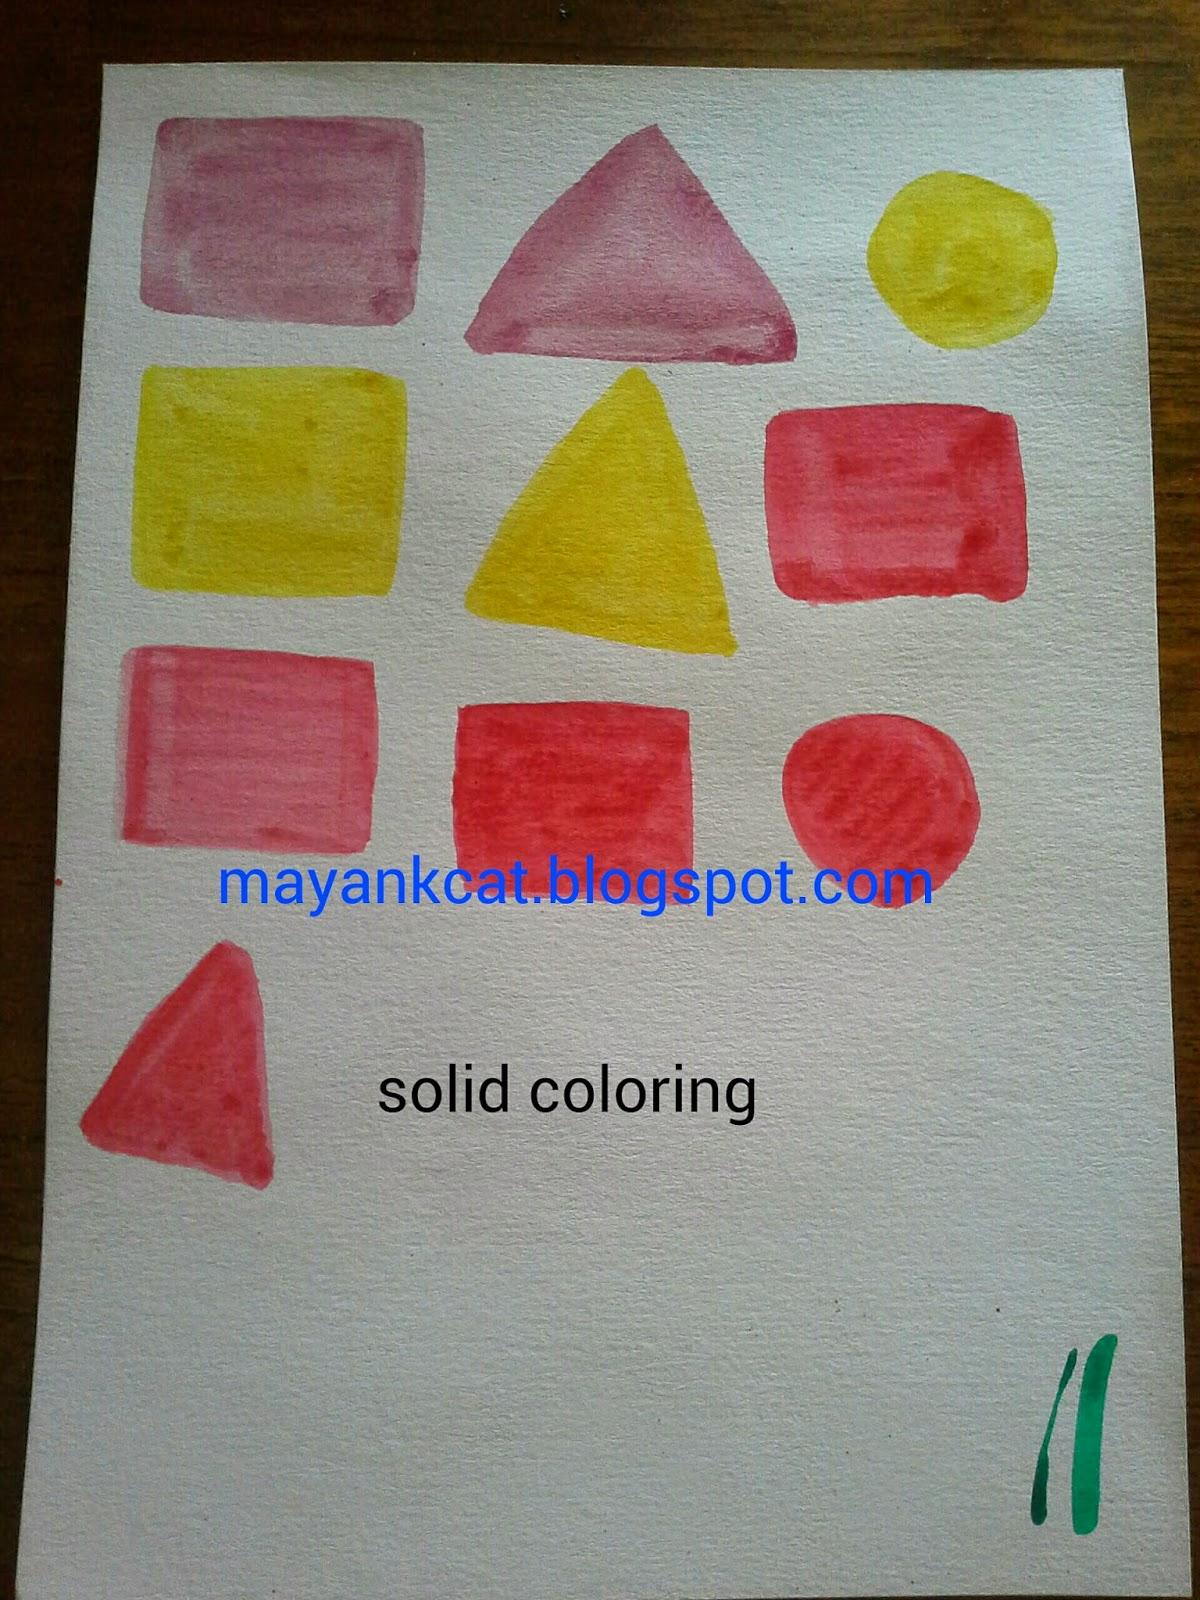 Teknik mewarnai berikutnya adalah solid coloring Kami diminta menggambar lingkaran segitiga dan segi empat dengan hasil warna yang merata